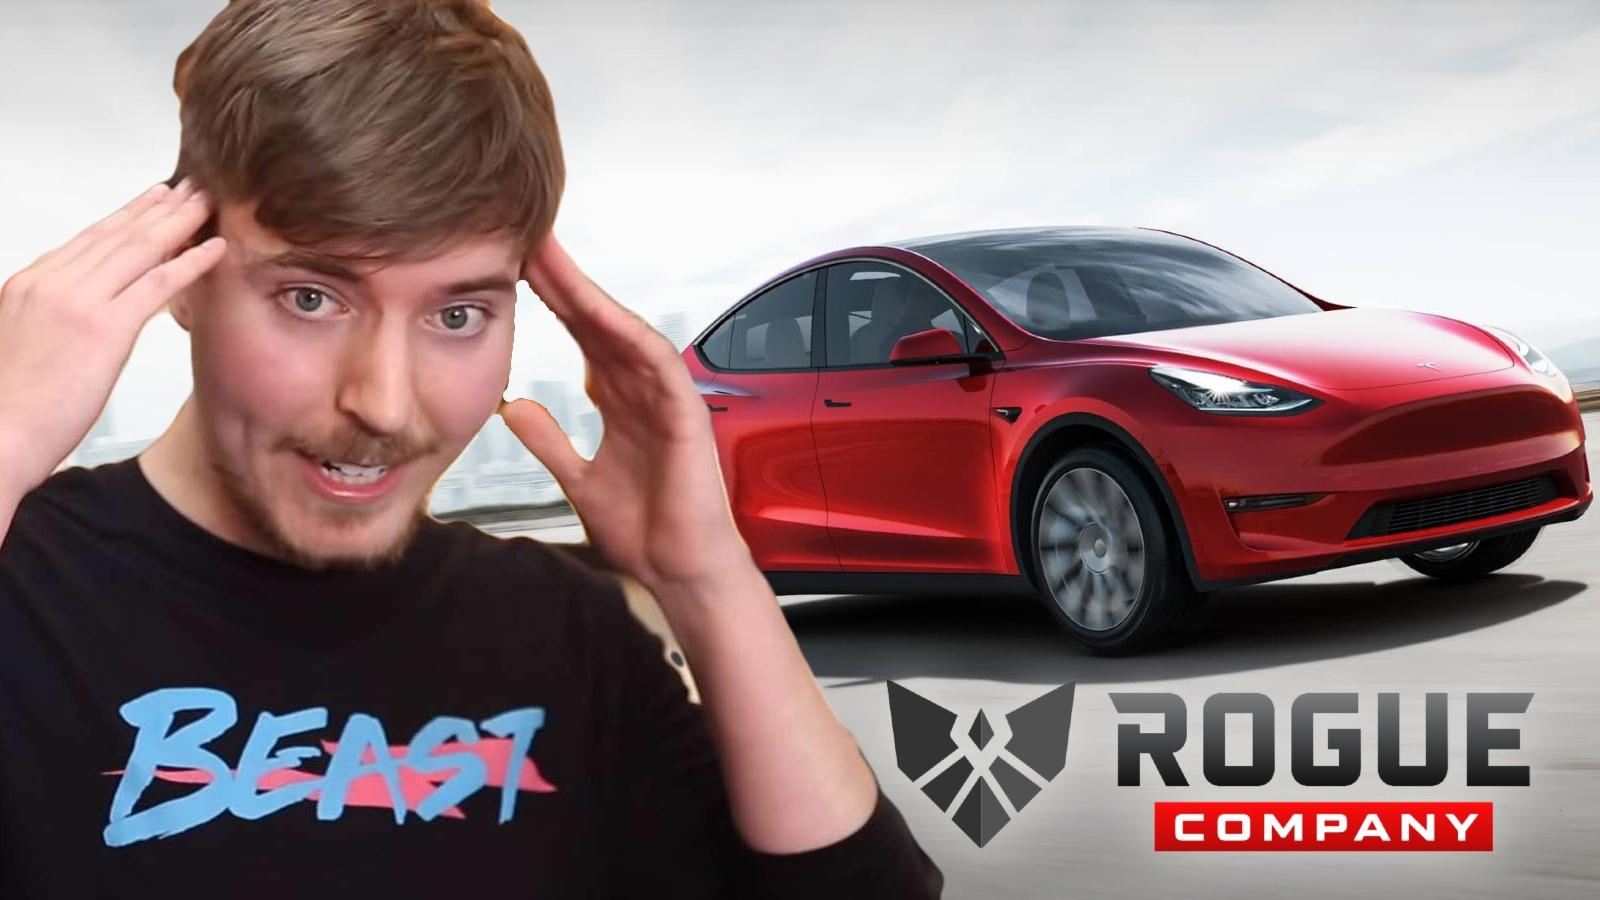 Mr Beast gives away free Tesla for Rogue Company wins